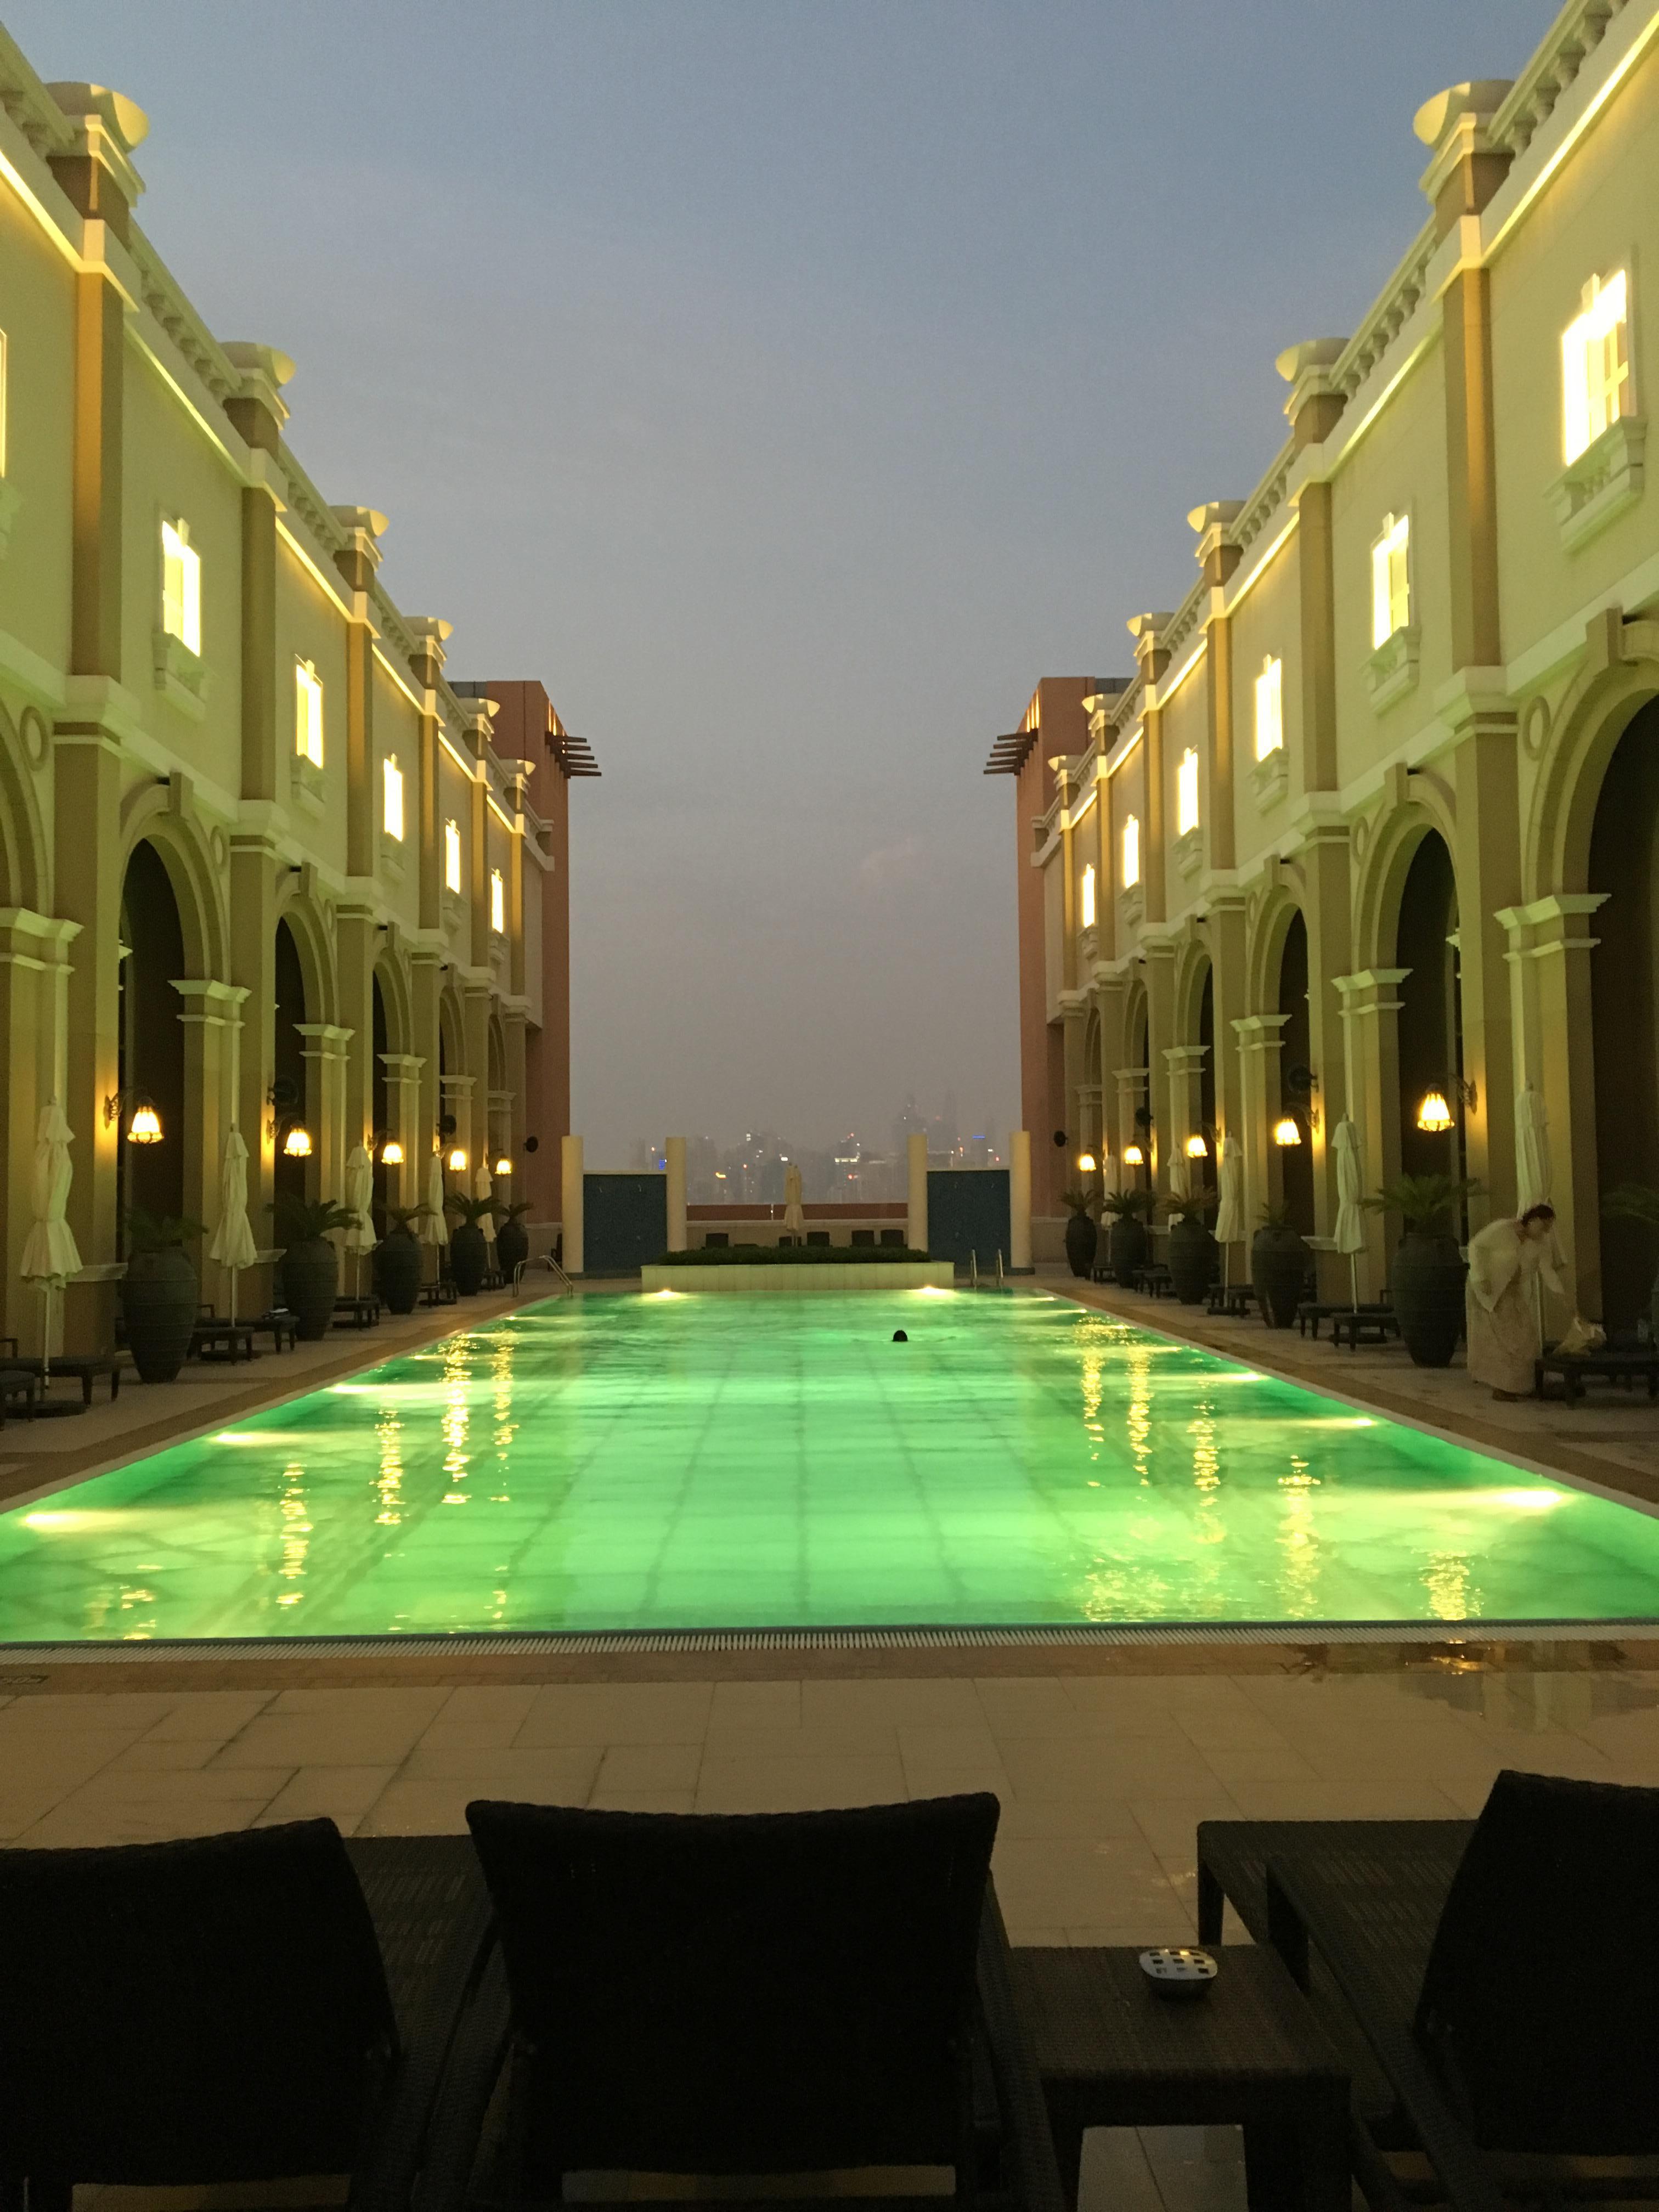 Movenpick Hotel Ibn Battuta Gate Dubai Reviews s & Rates